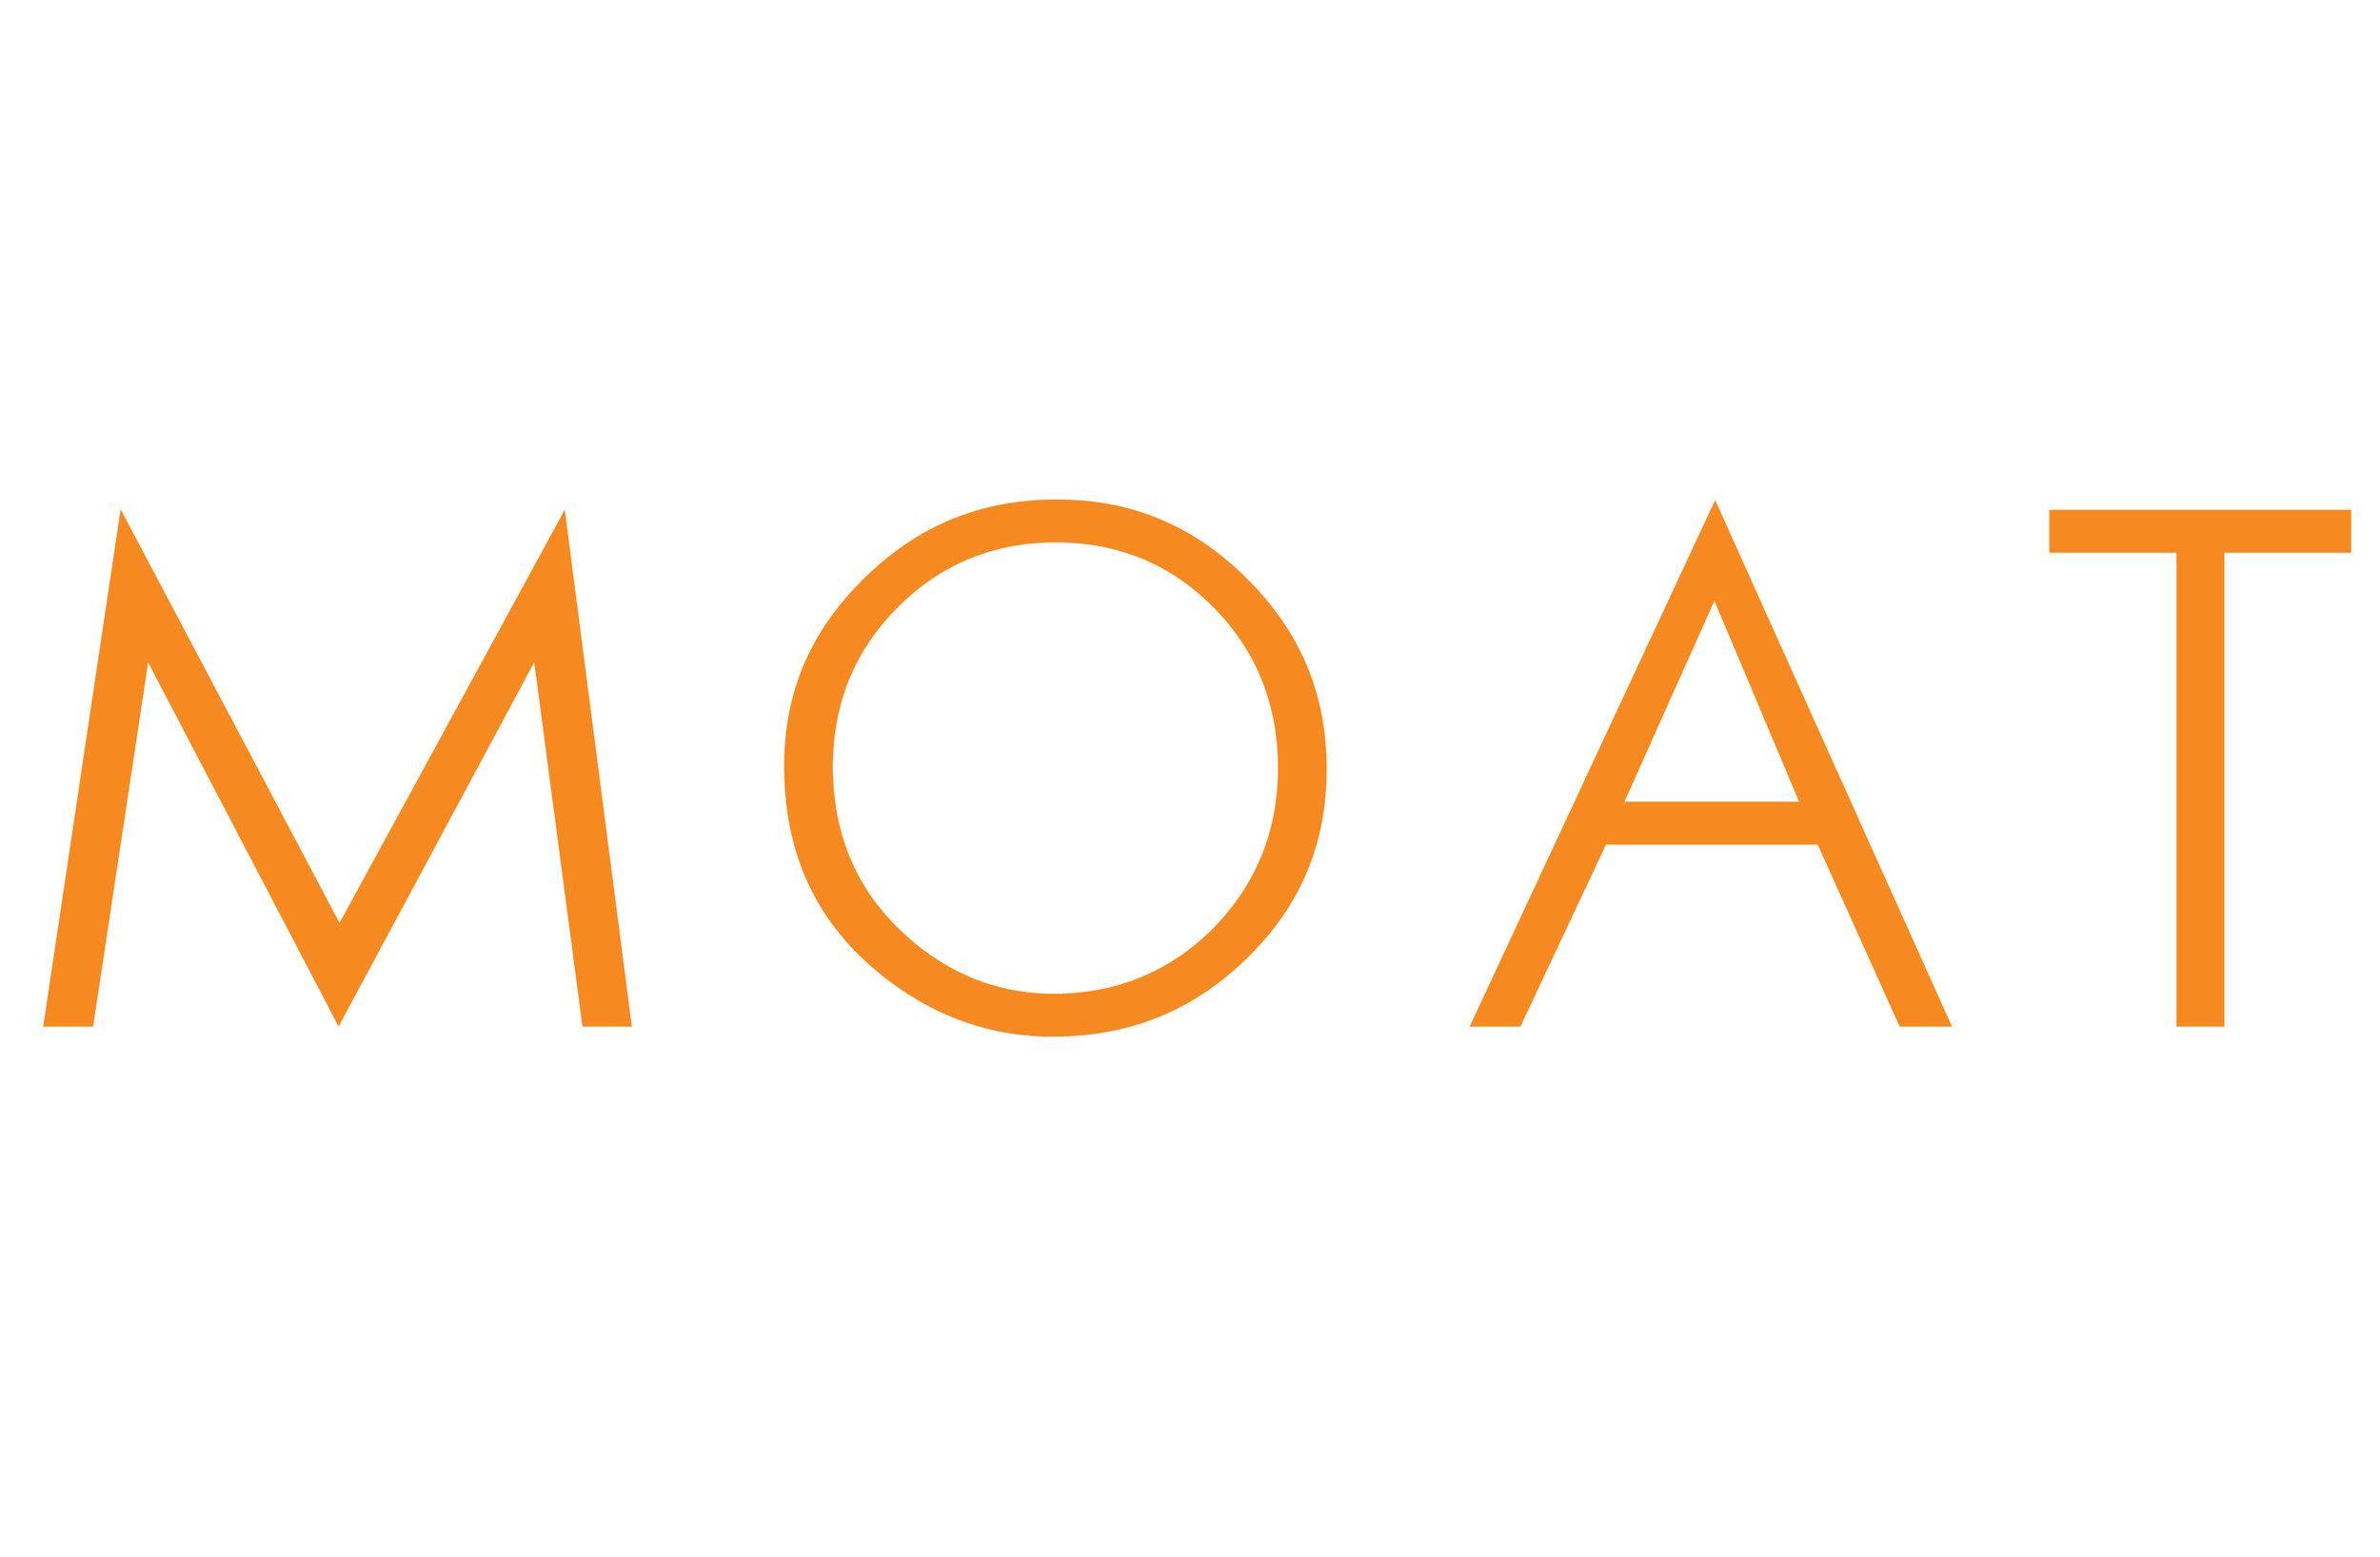 Moat_Logo_HiDef.jpg